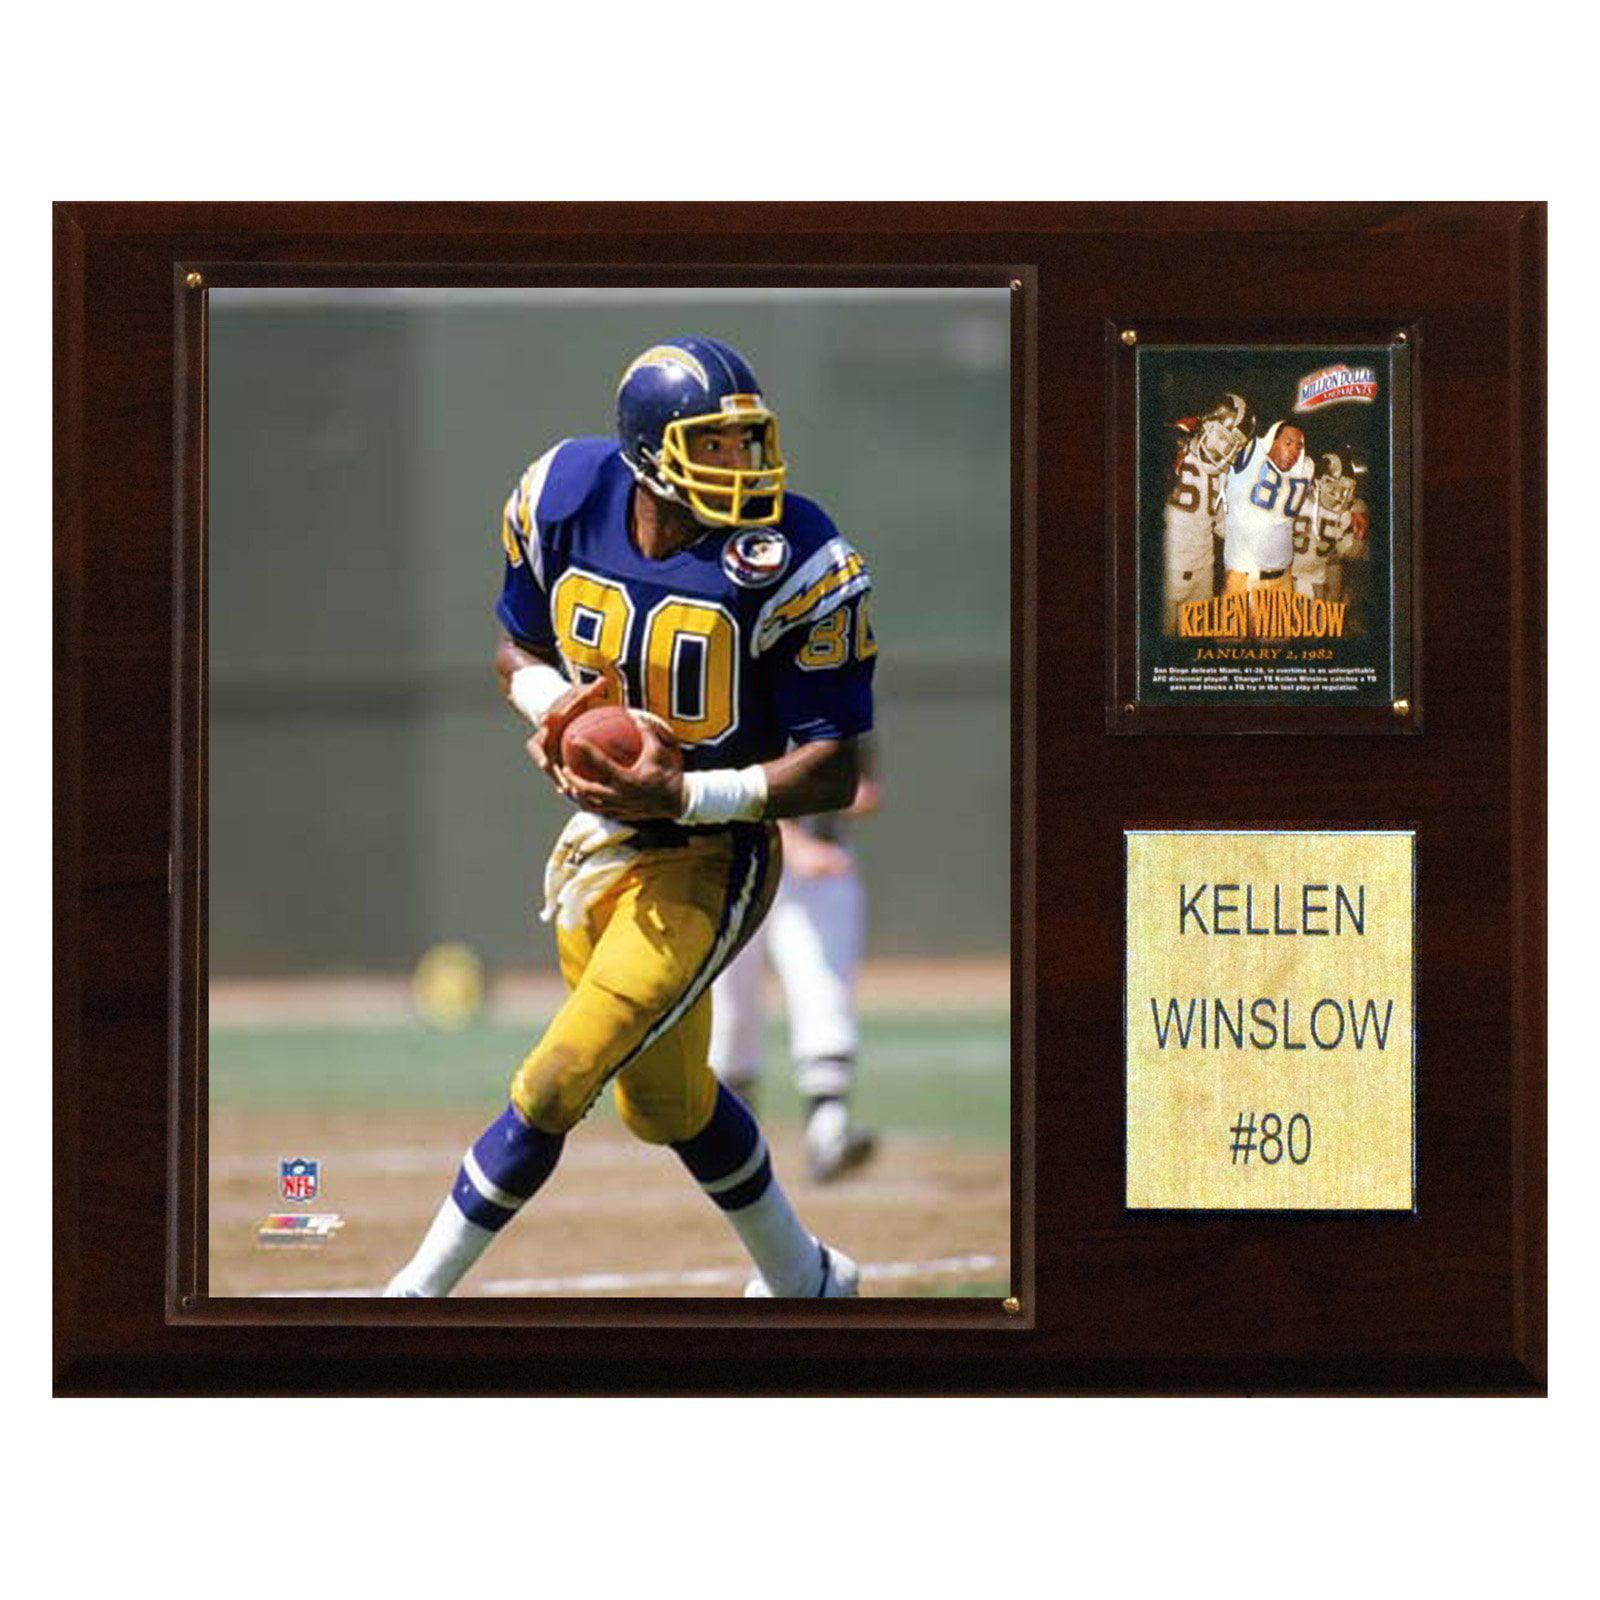 C&I Collectables NFL 12x15 Kellen Winslow San Diego Chargers Player Plaque